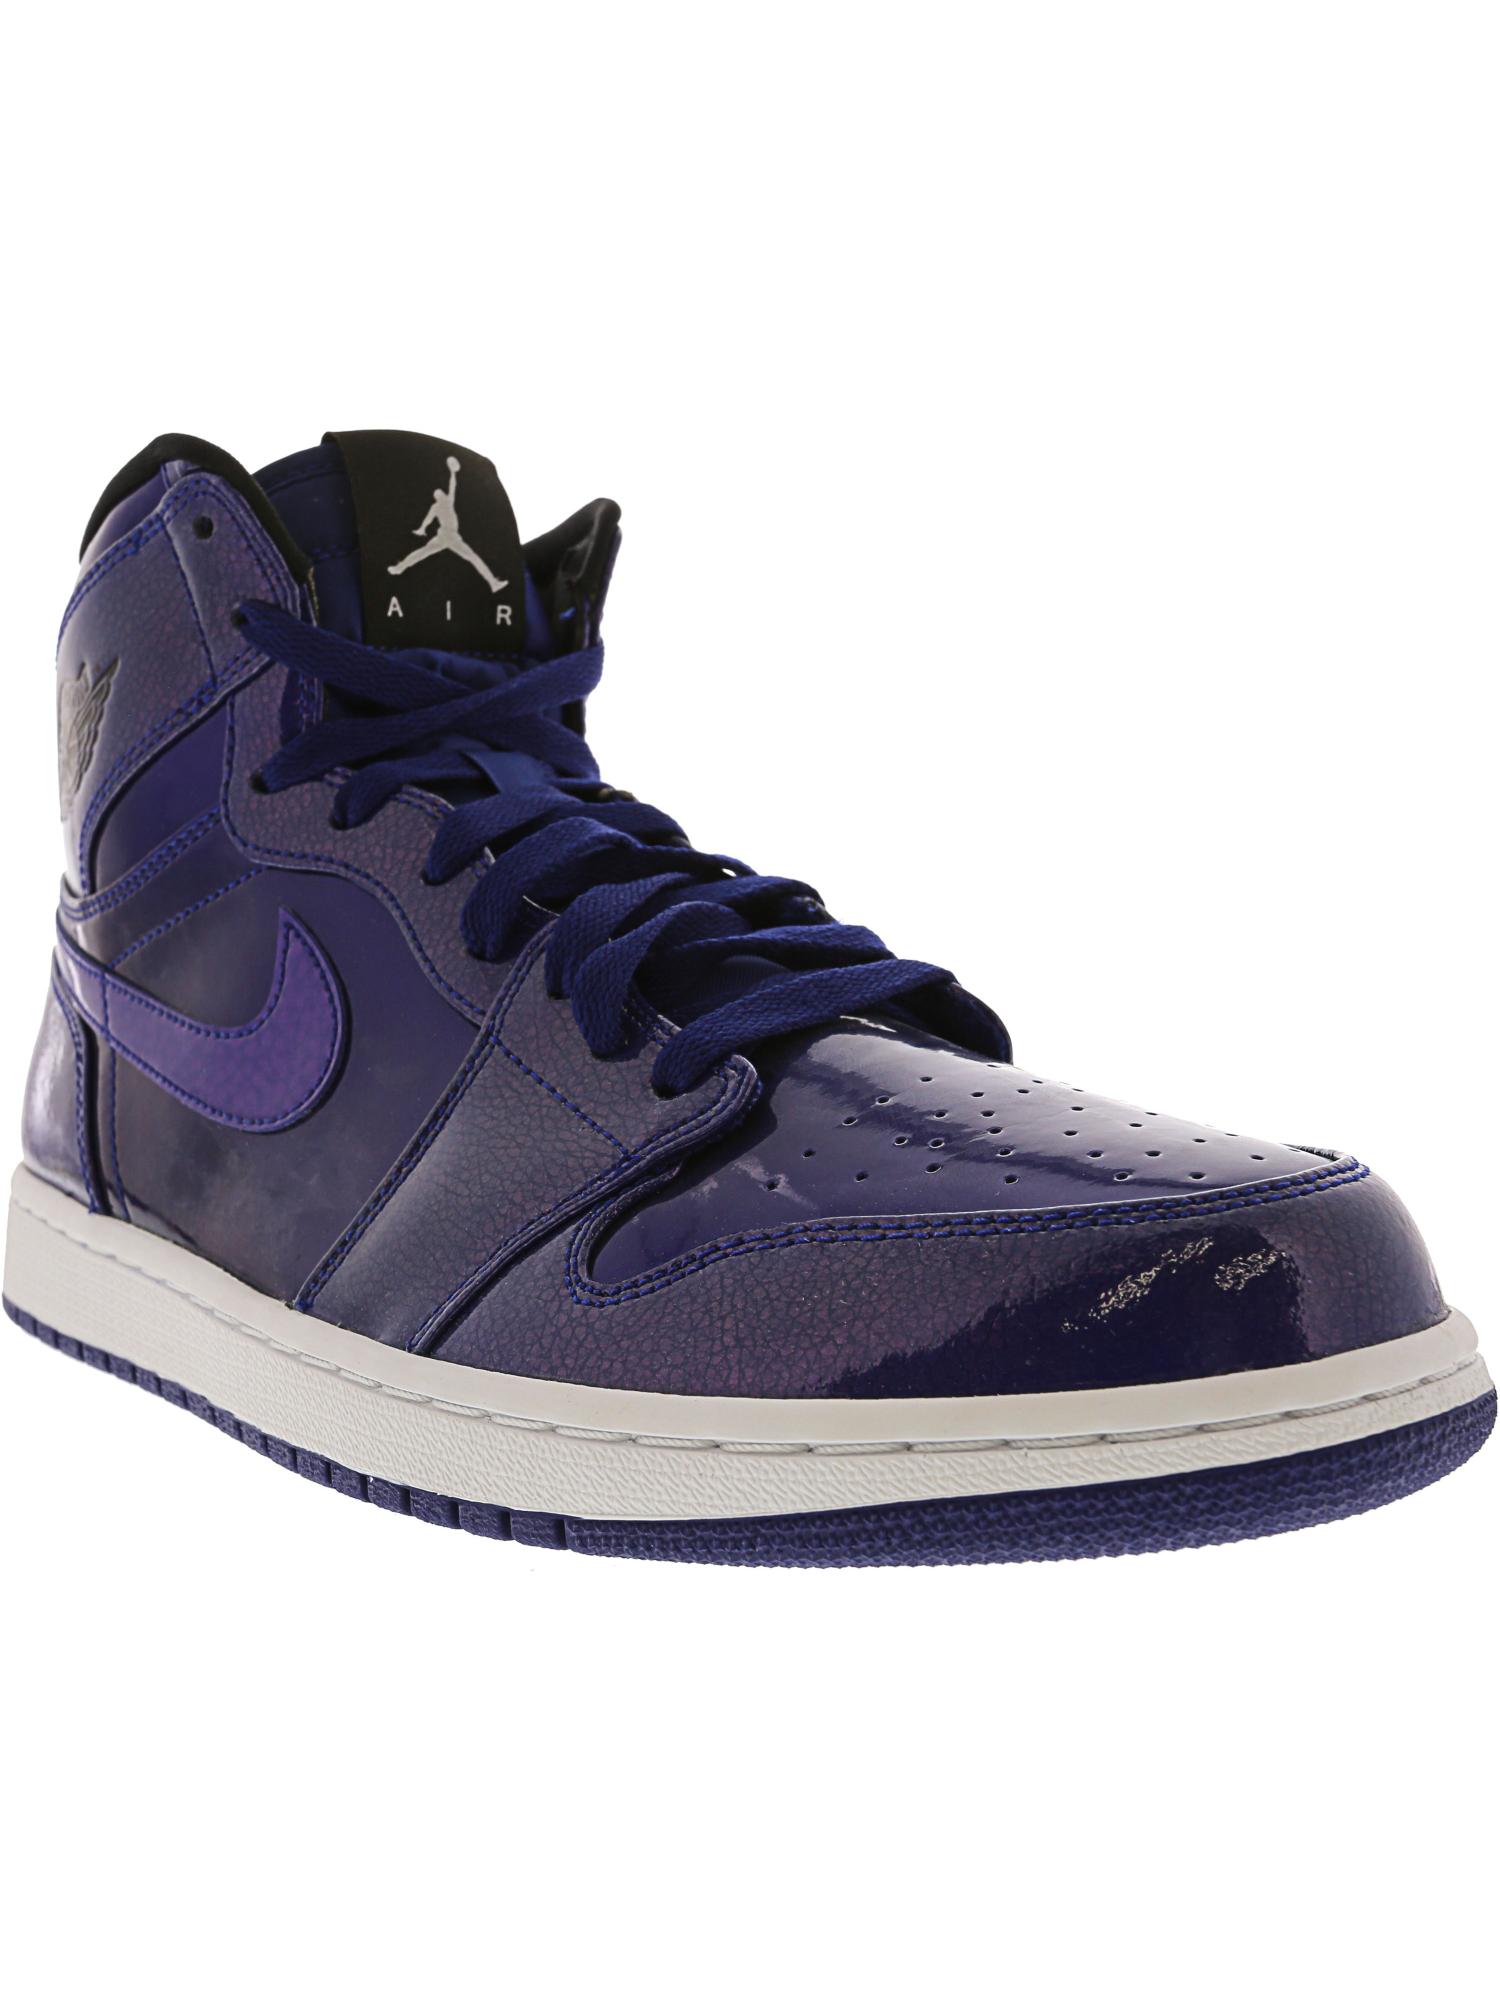 Nike Men/'s Air Jordan Retro High High-Top Basketball Shoe